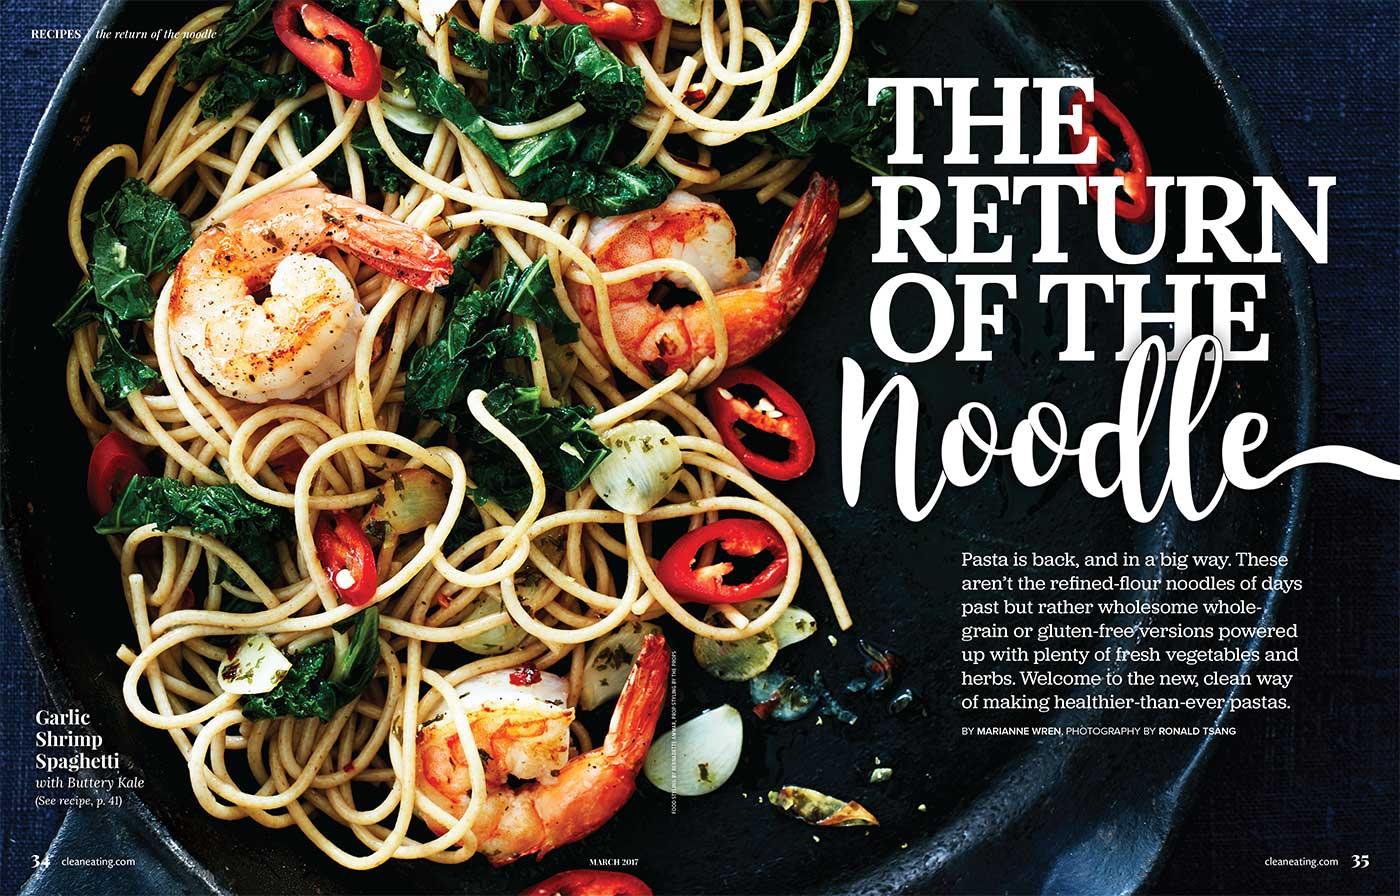 Heathier Than Ever Pasta Recipes Written by Toronto Food Stylist and Recipe Developer Marianne Wren